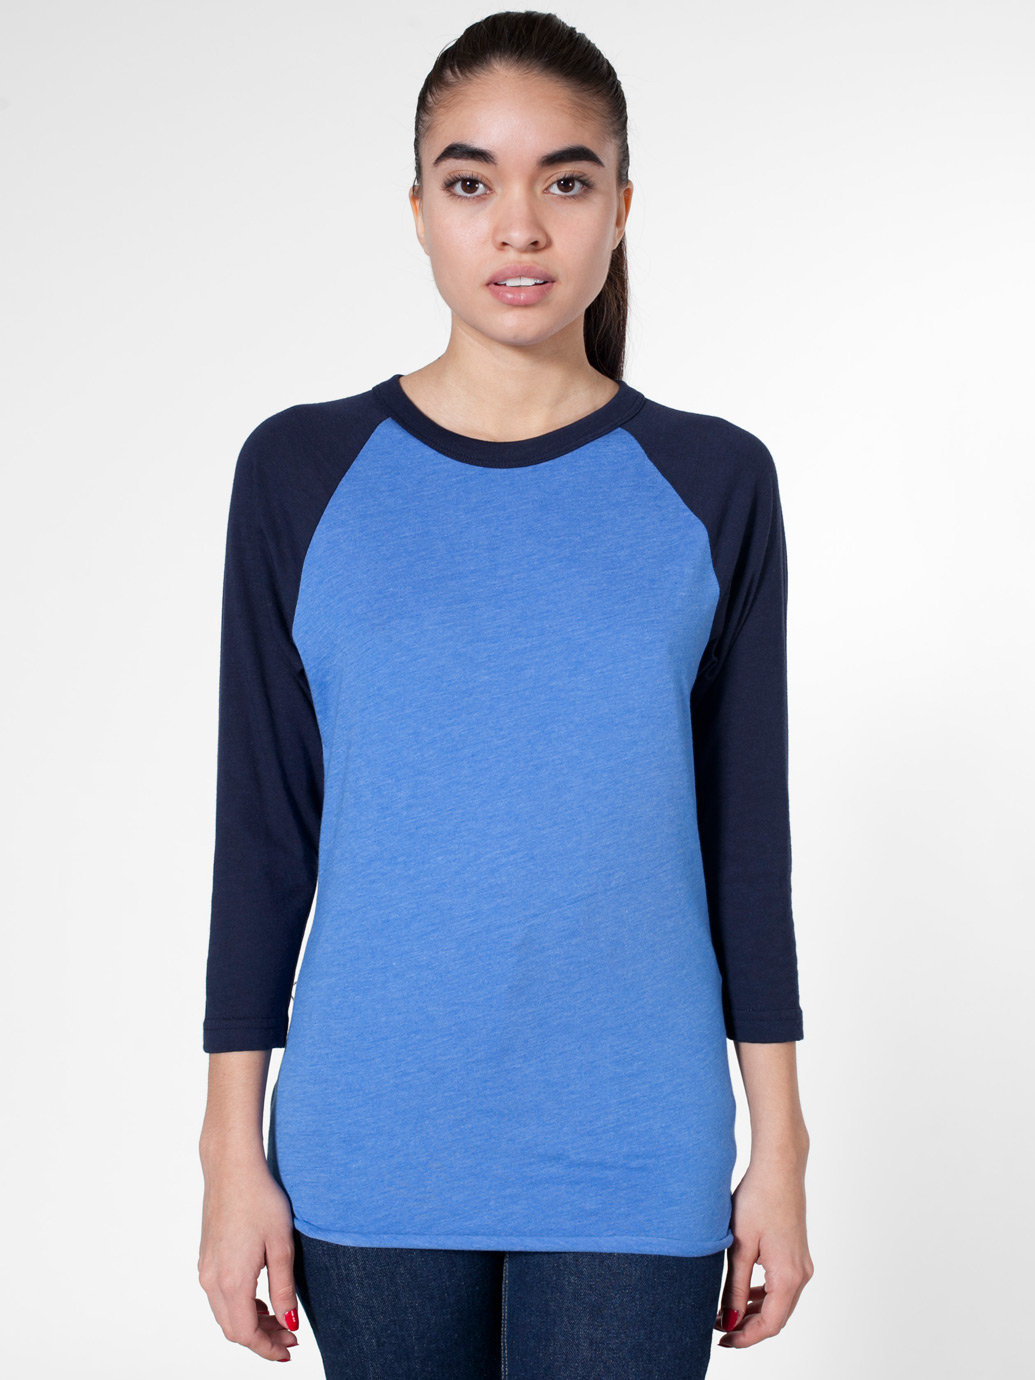 Unisex Poly-Cotton 3/4 Sleeve Raglan Shirt   American Apparel